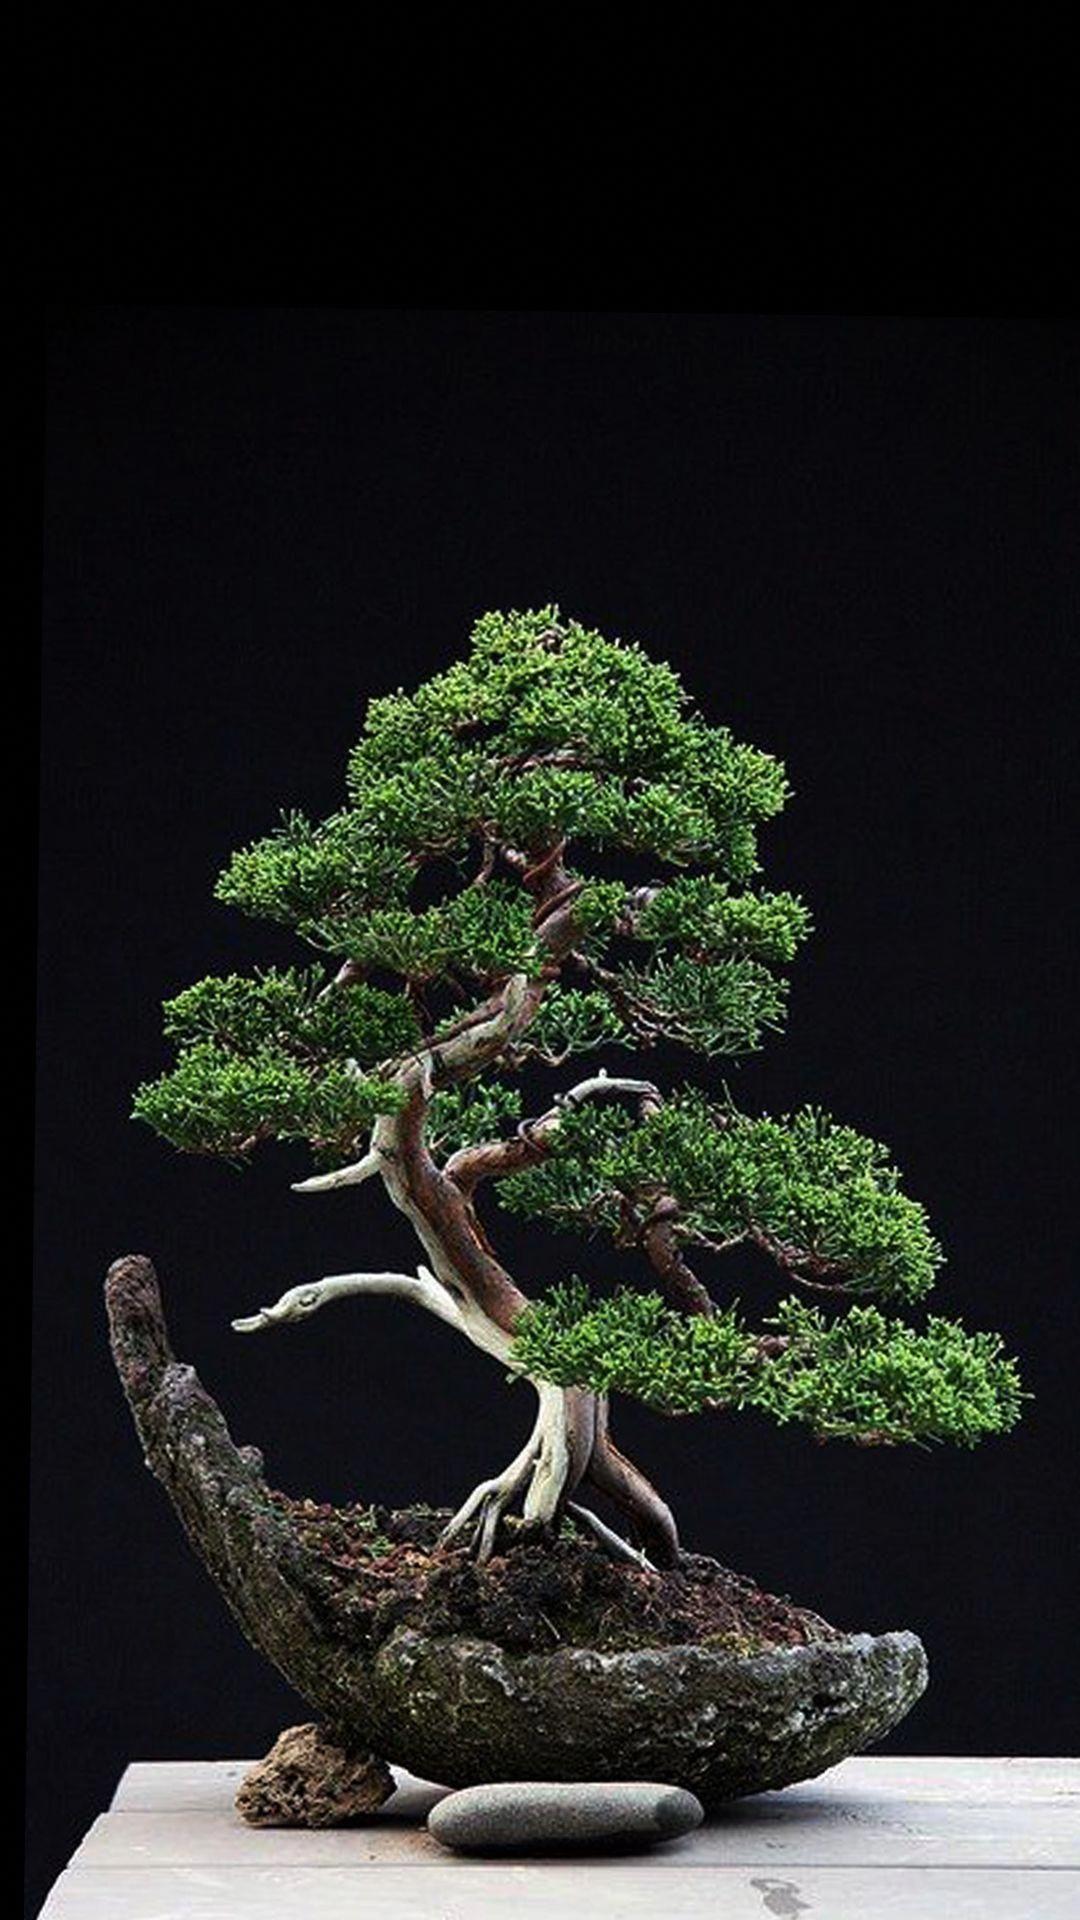 Phone Wallpaper From Zedge Bonsai Typesofbonsaitrees Bonsai Tree Japanese Bonsai Tree Bonsai Tree Types